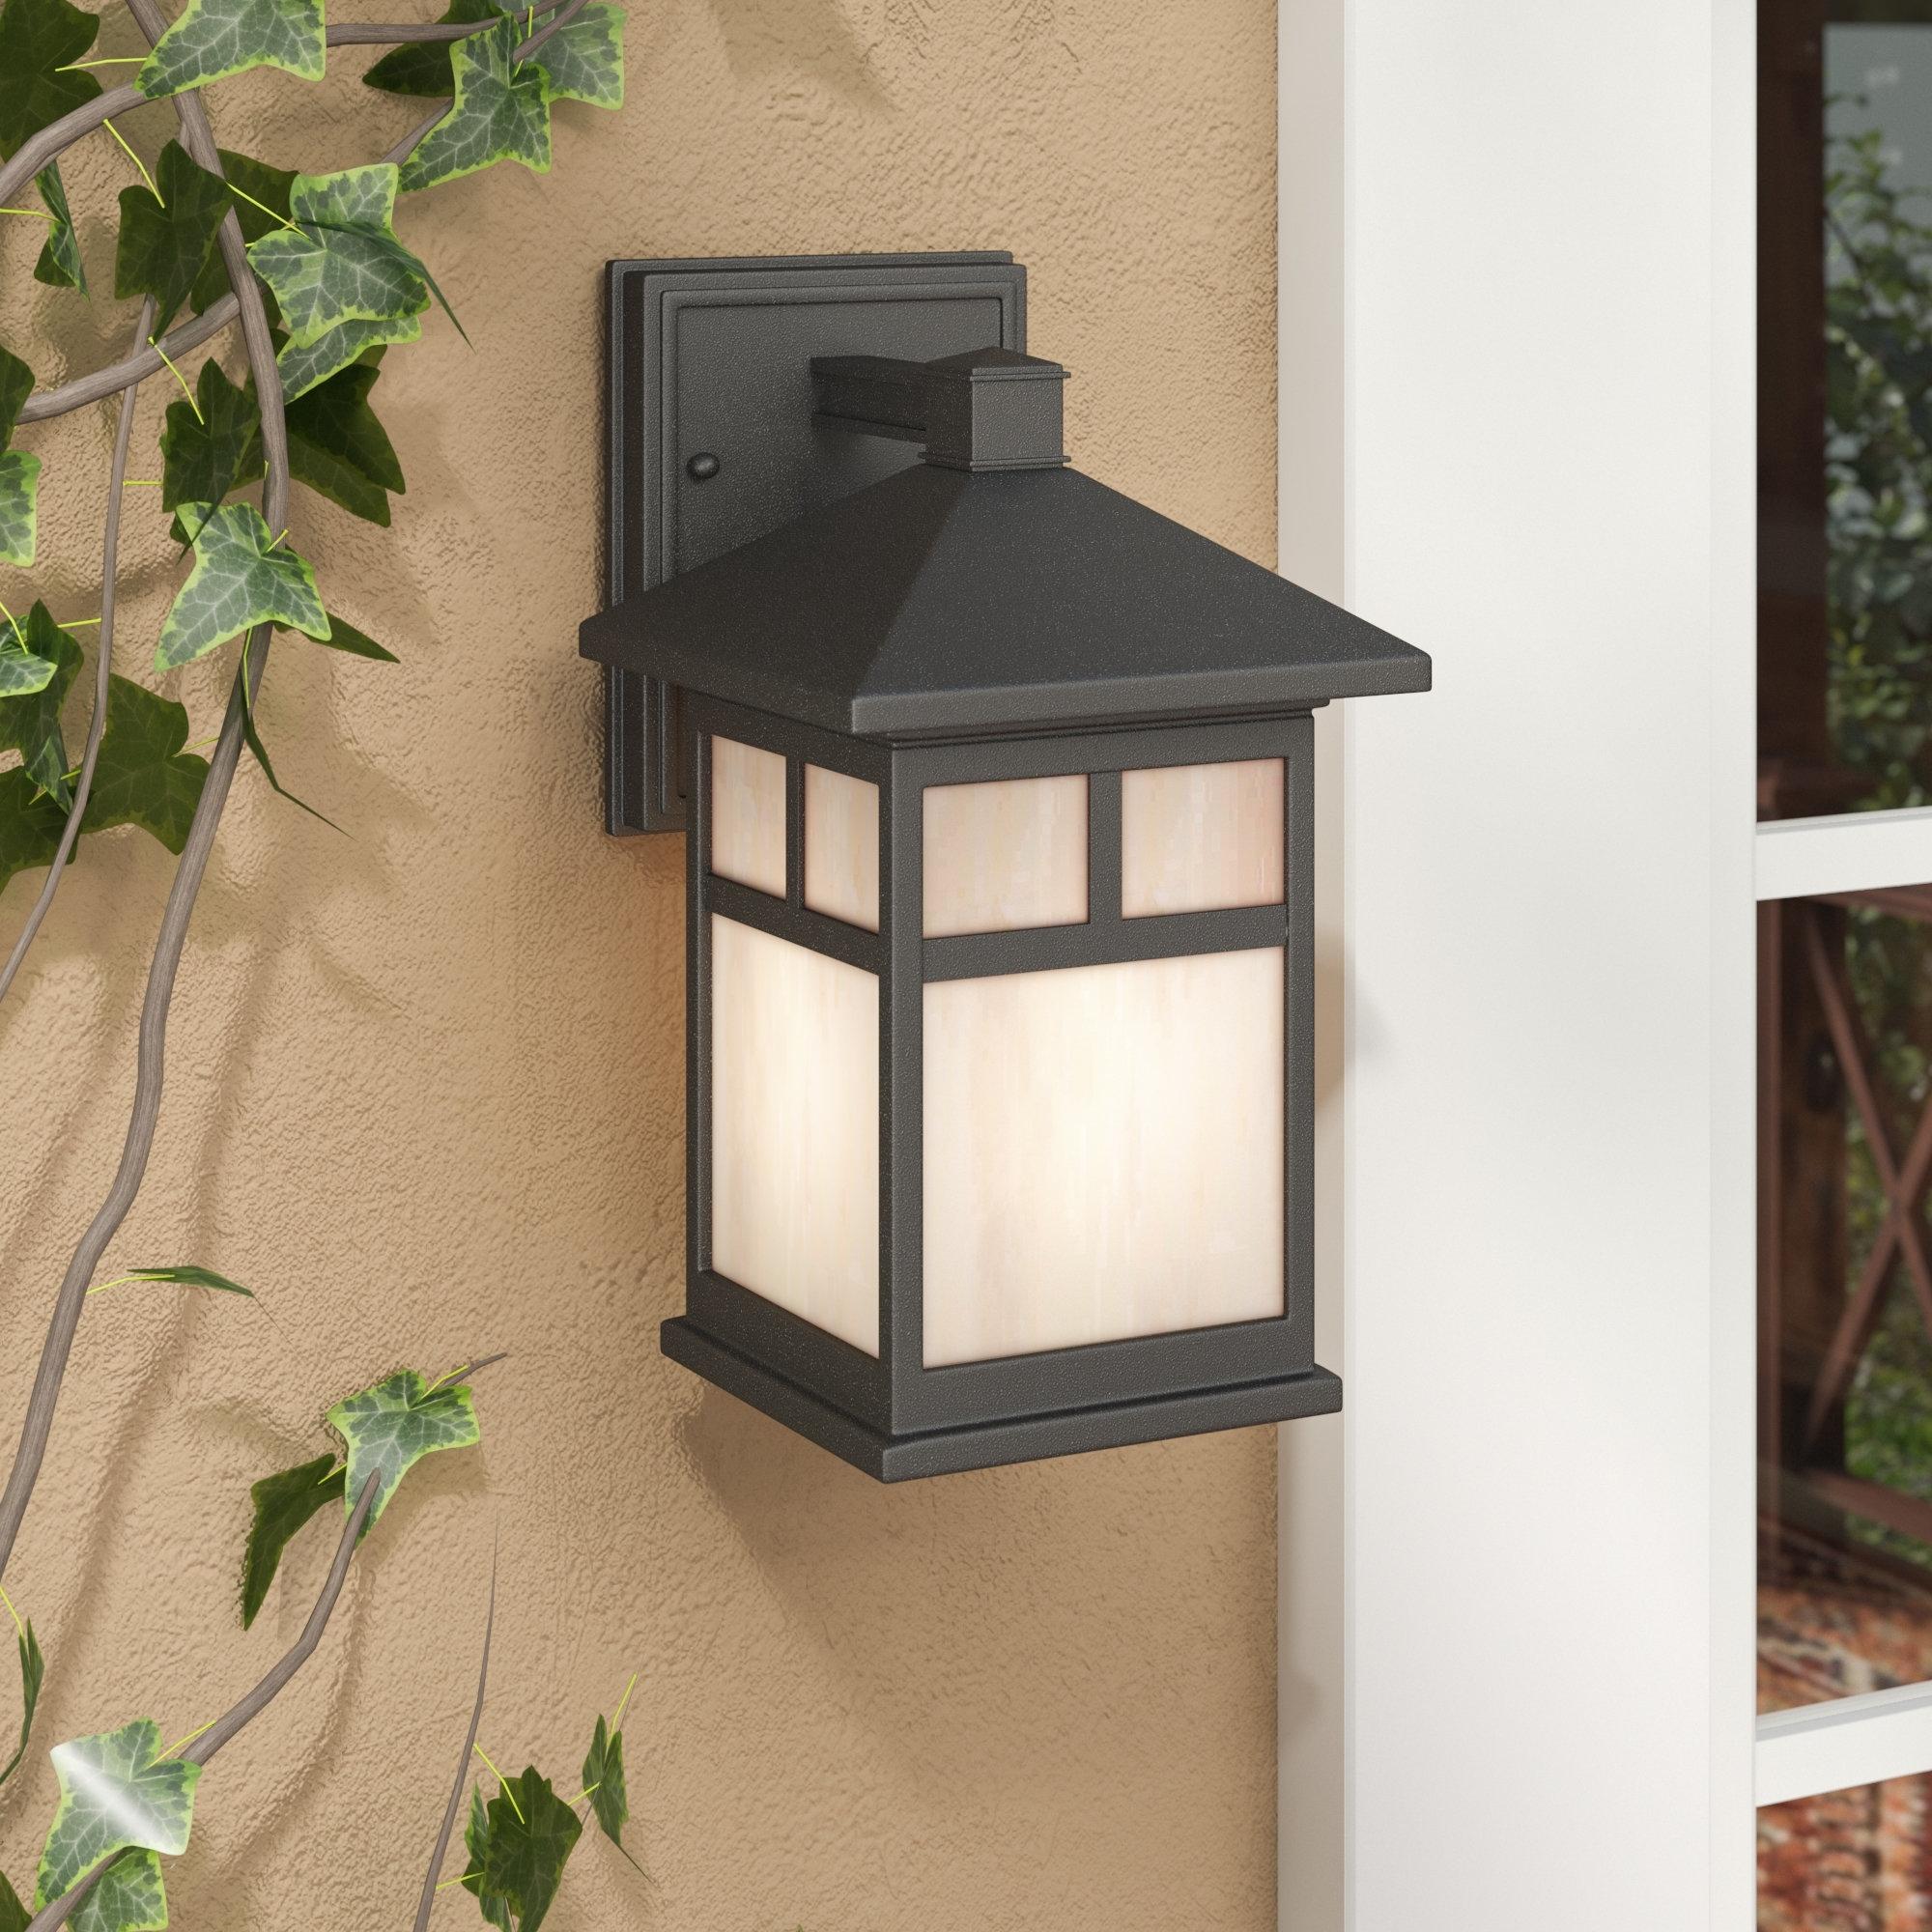 Loon Peak Burtundy 1 Light Outdoor Wall Lantern & Reviews | Wayfair Regarding Outdoor Oversized Lanterns (View 17 of 20)